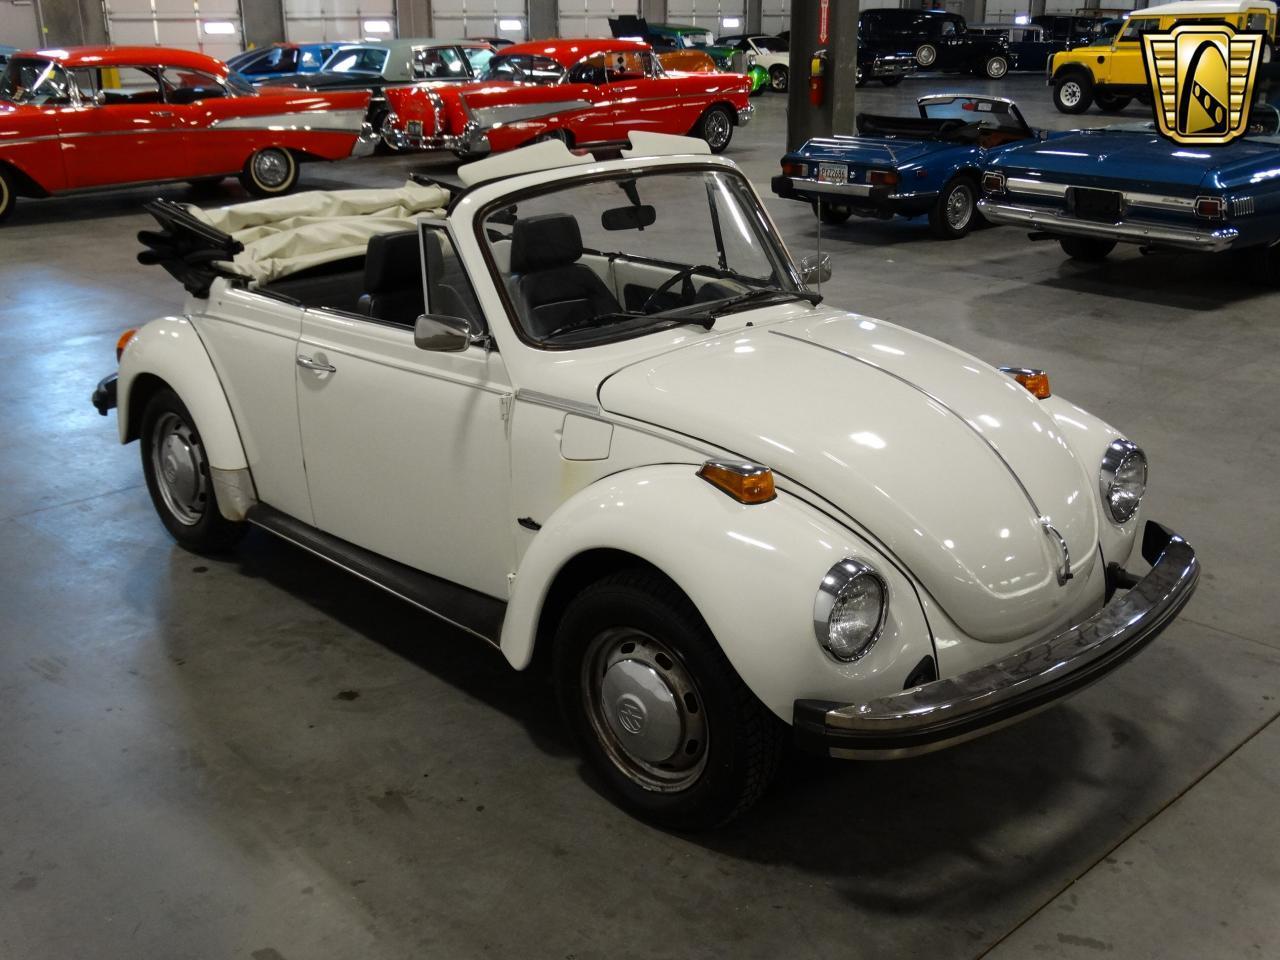 1978 Volkswagen Beetle For Sale Classiccars Com Cc 965481